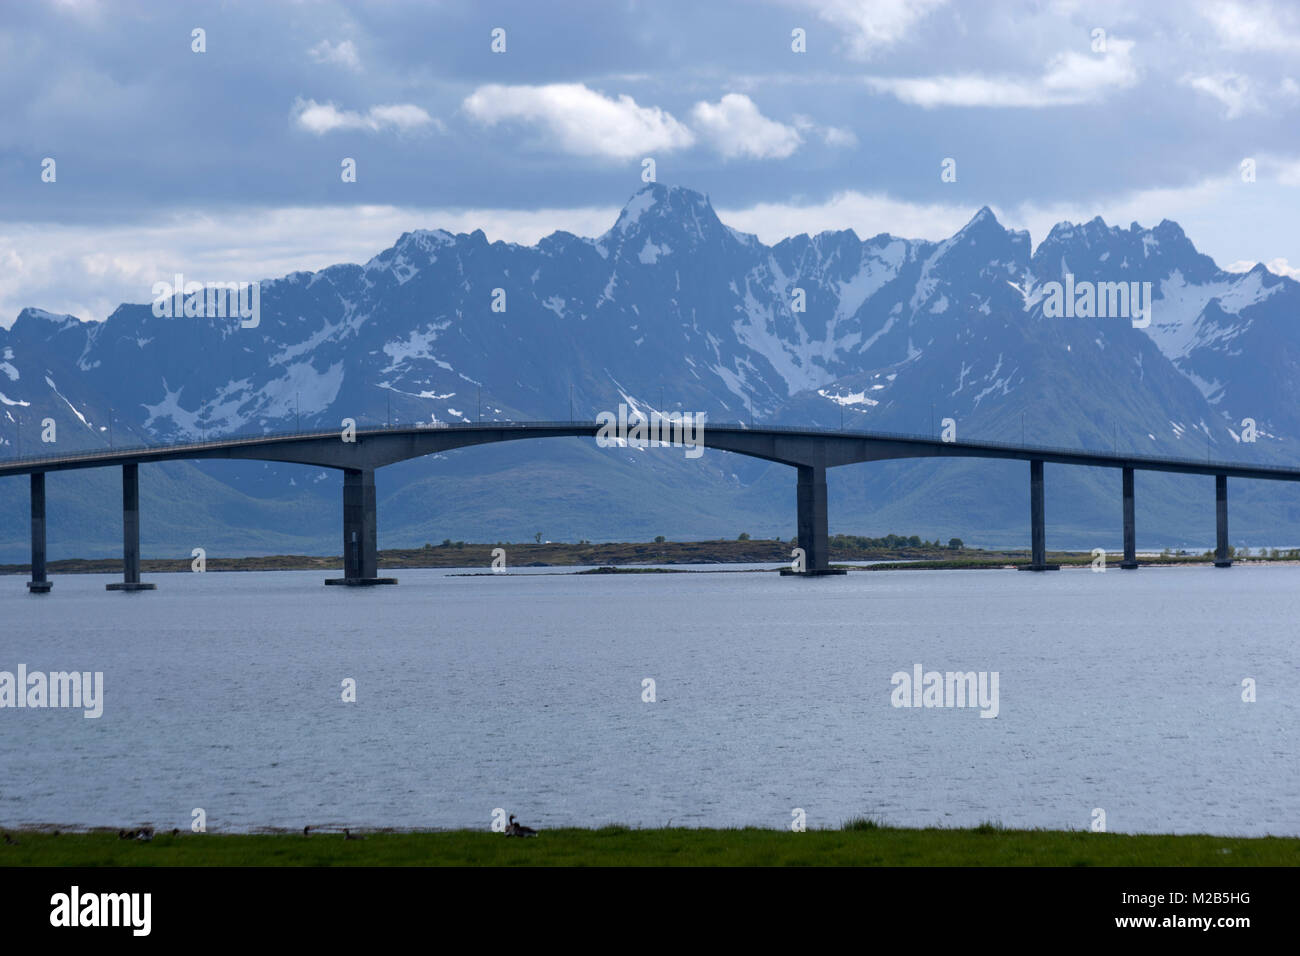 Bridge joint islands, type of Cantilever bridge,  in the Lofoten archipelago, county of Nordland, Norway. - Stock Image